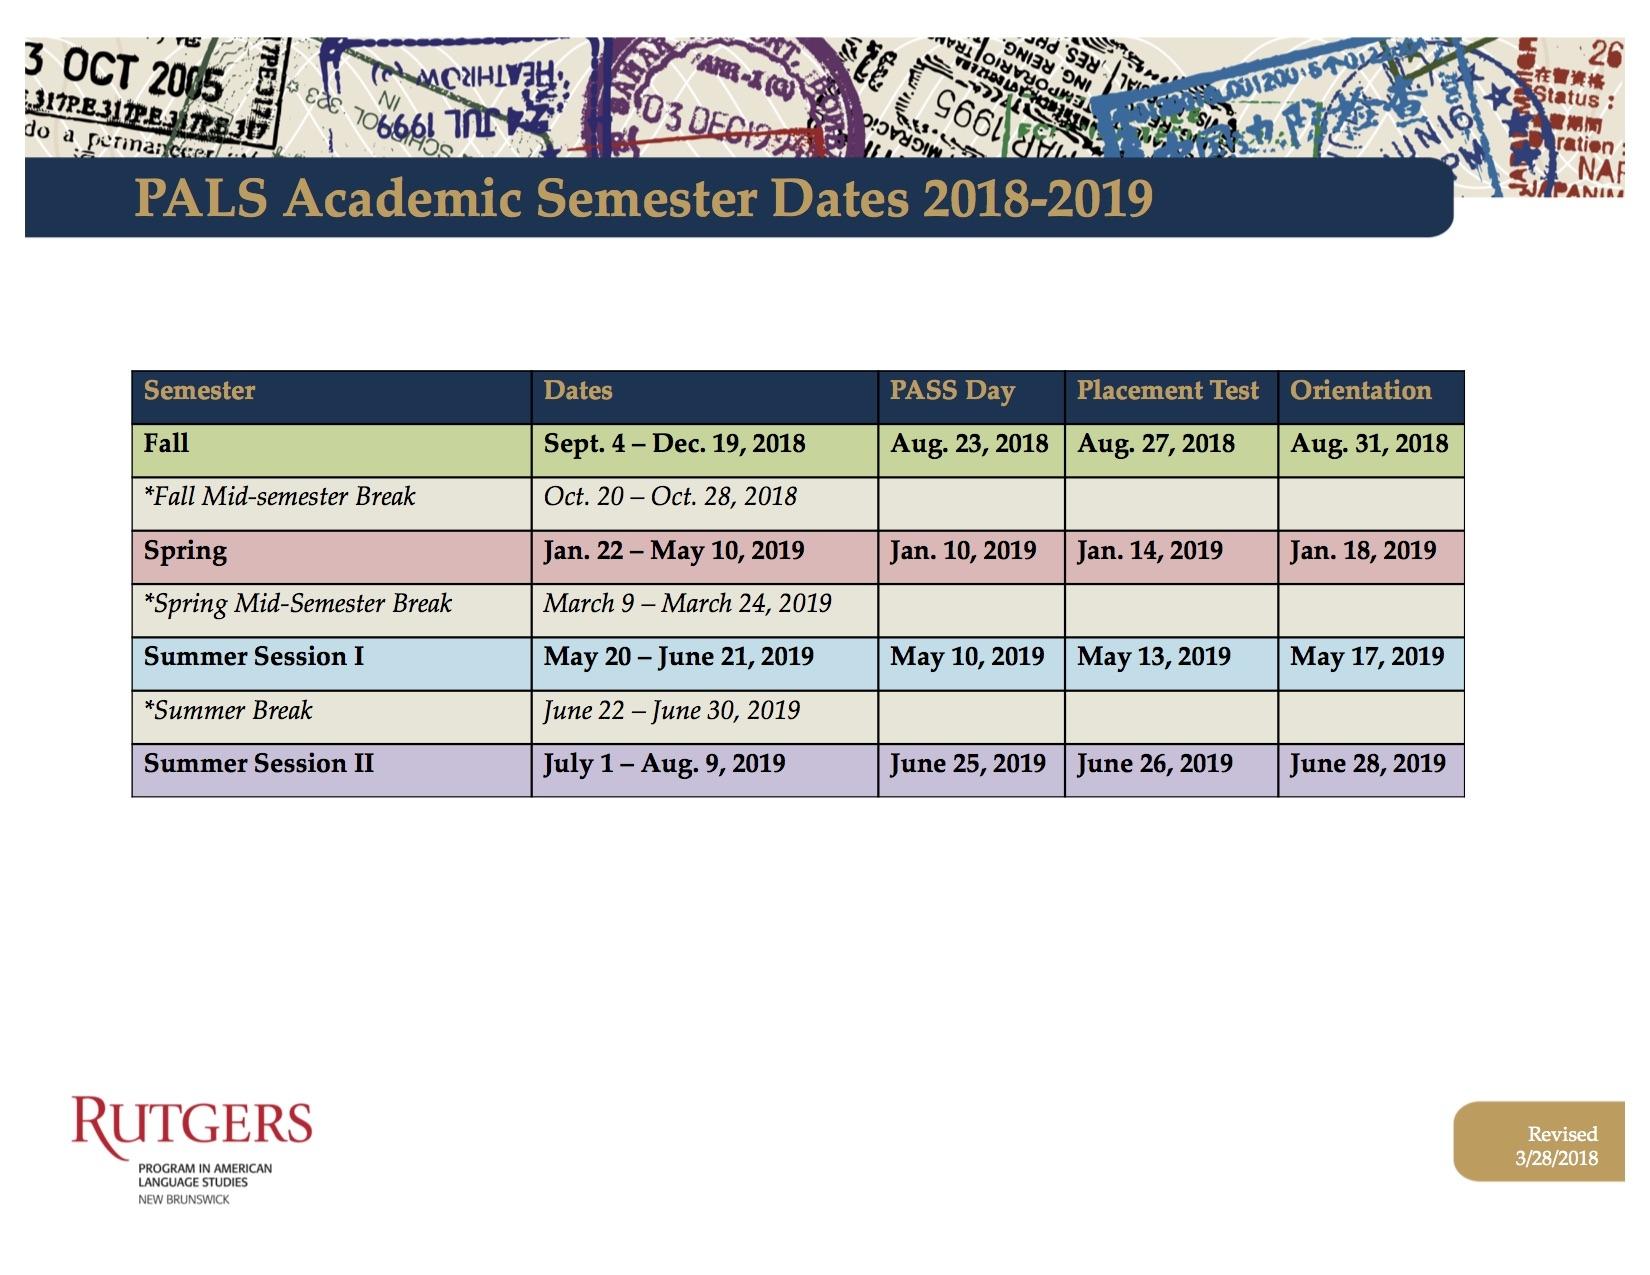 Rutgers Academic Calendar